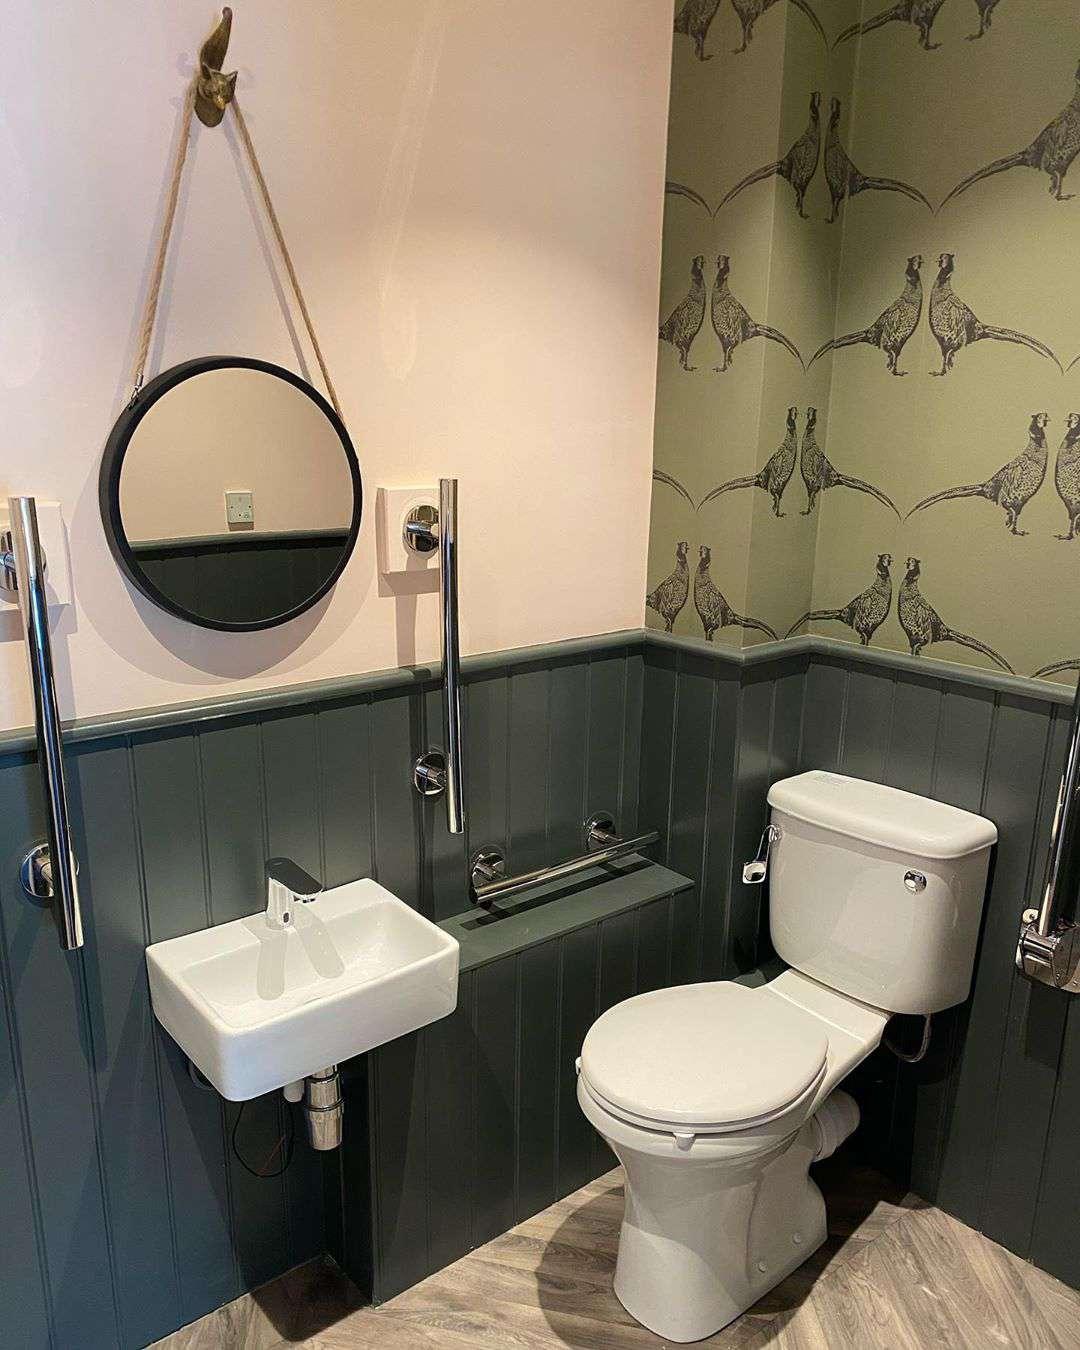 Bathroom with green siding